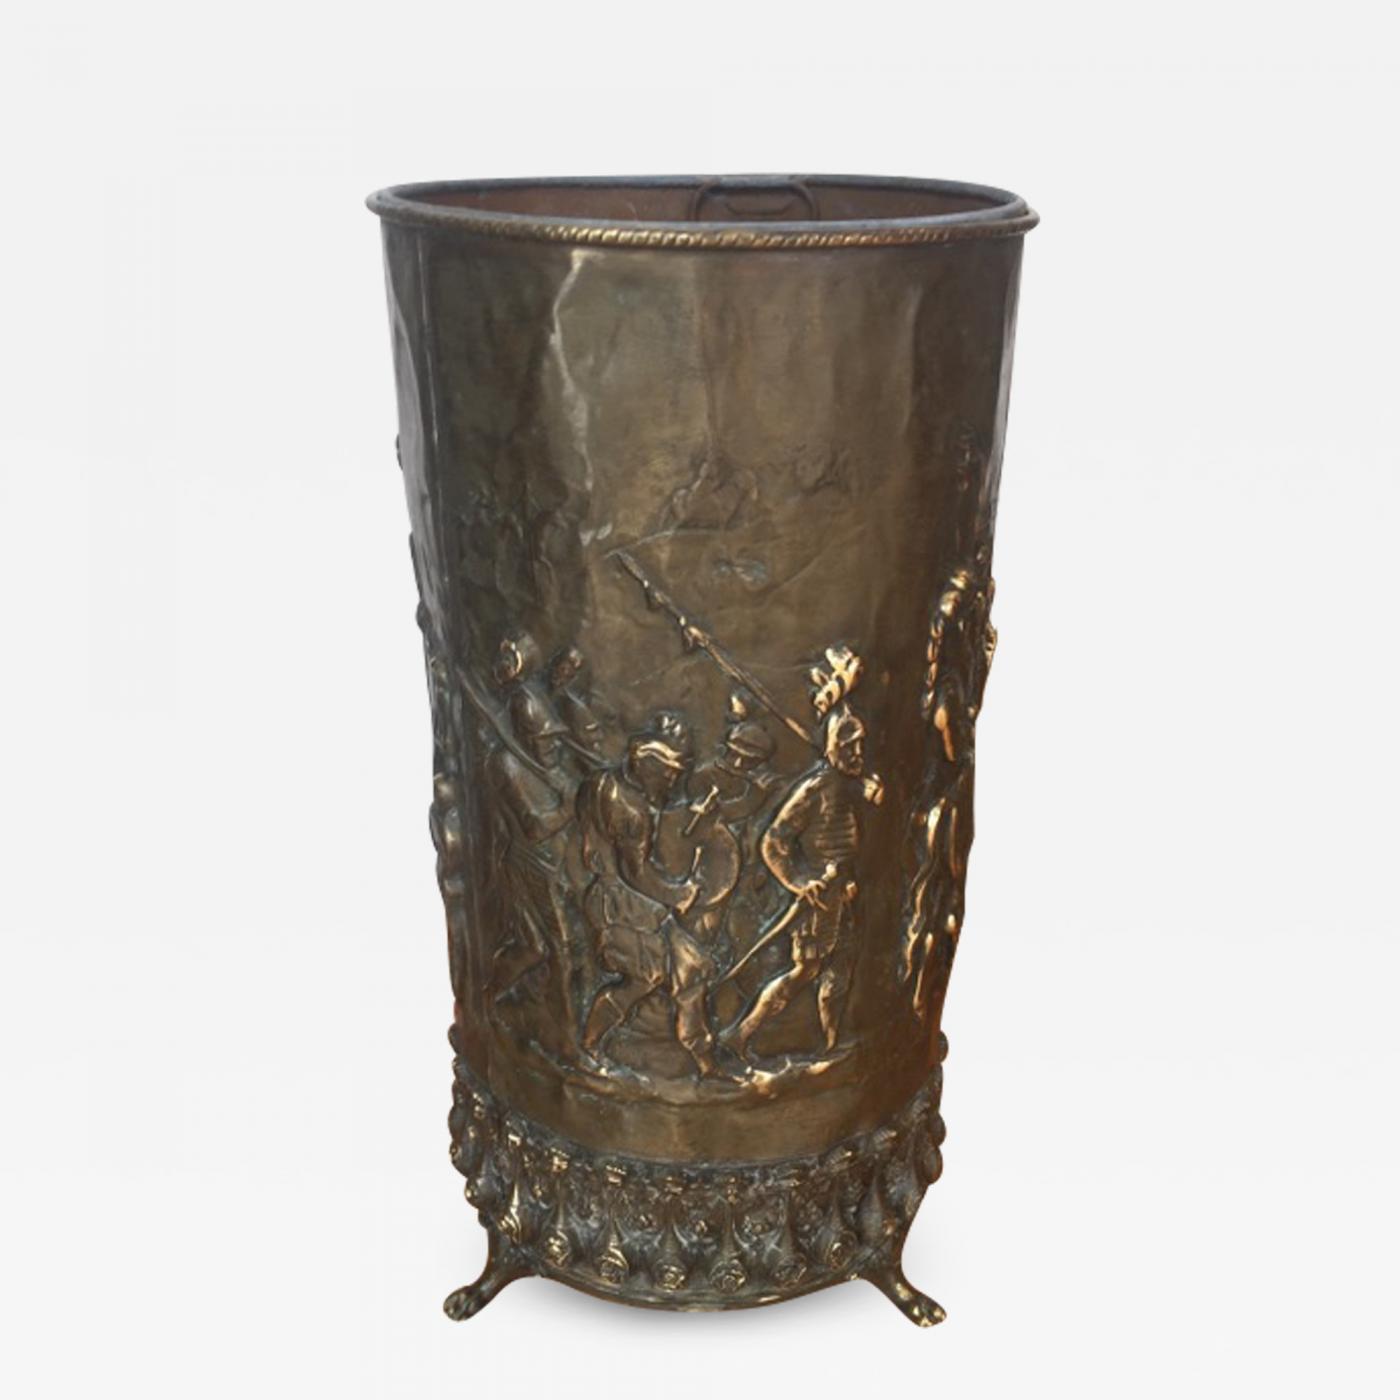 f25833d1c9cd Listings   Decorative Arts   Objects   Umbrella Stands · Large Brass  Umbrella Stand